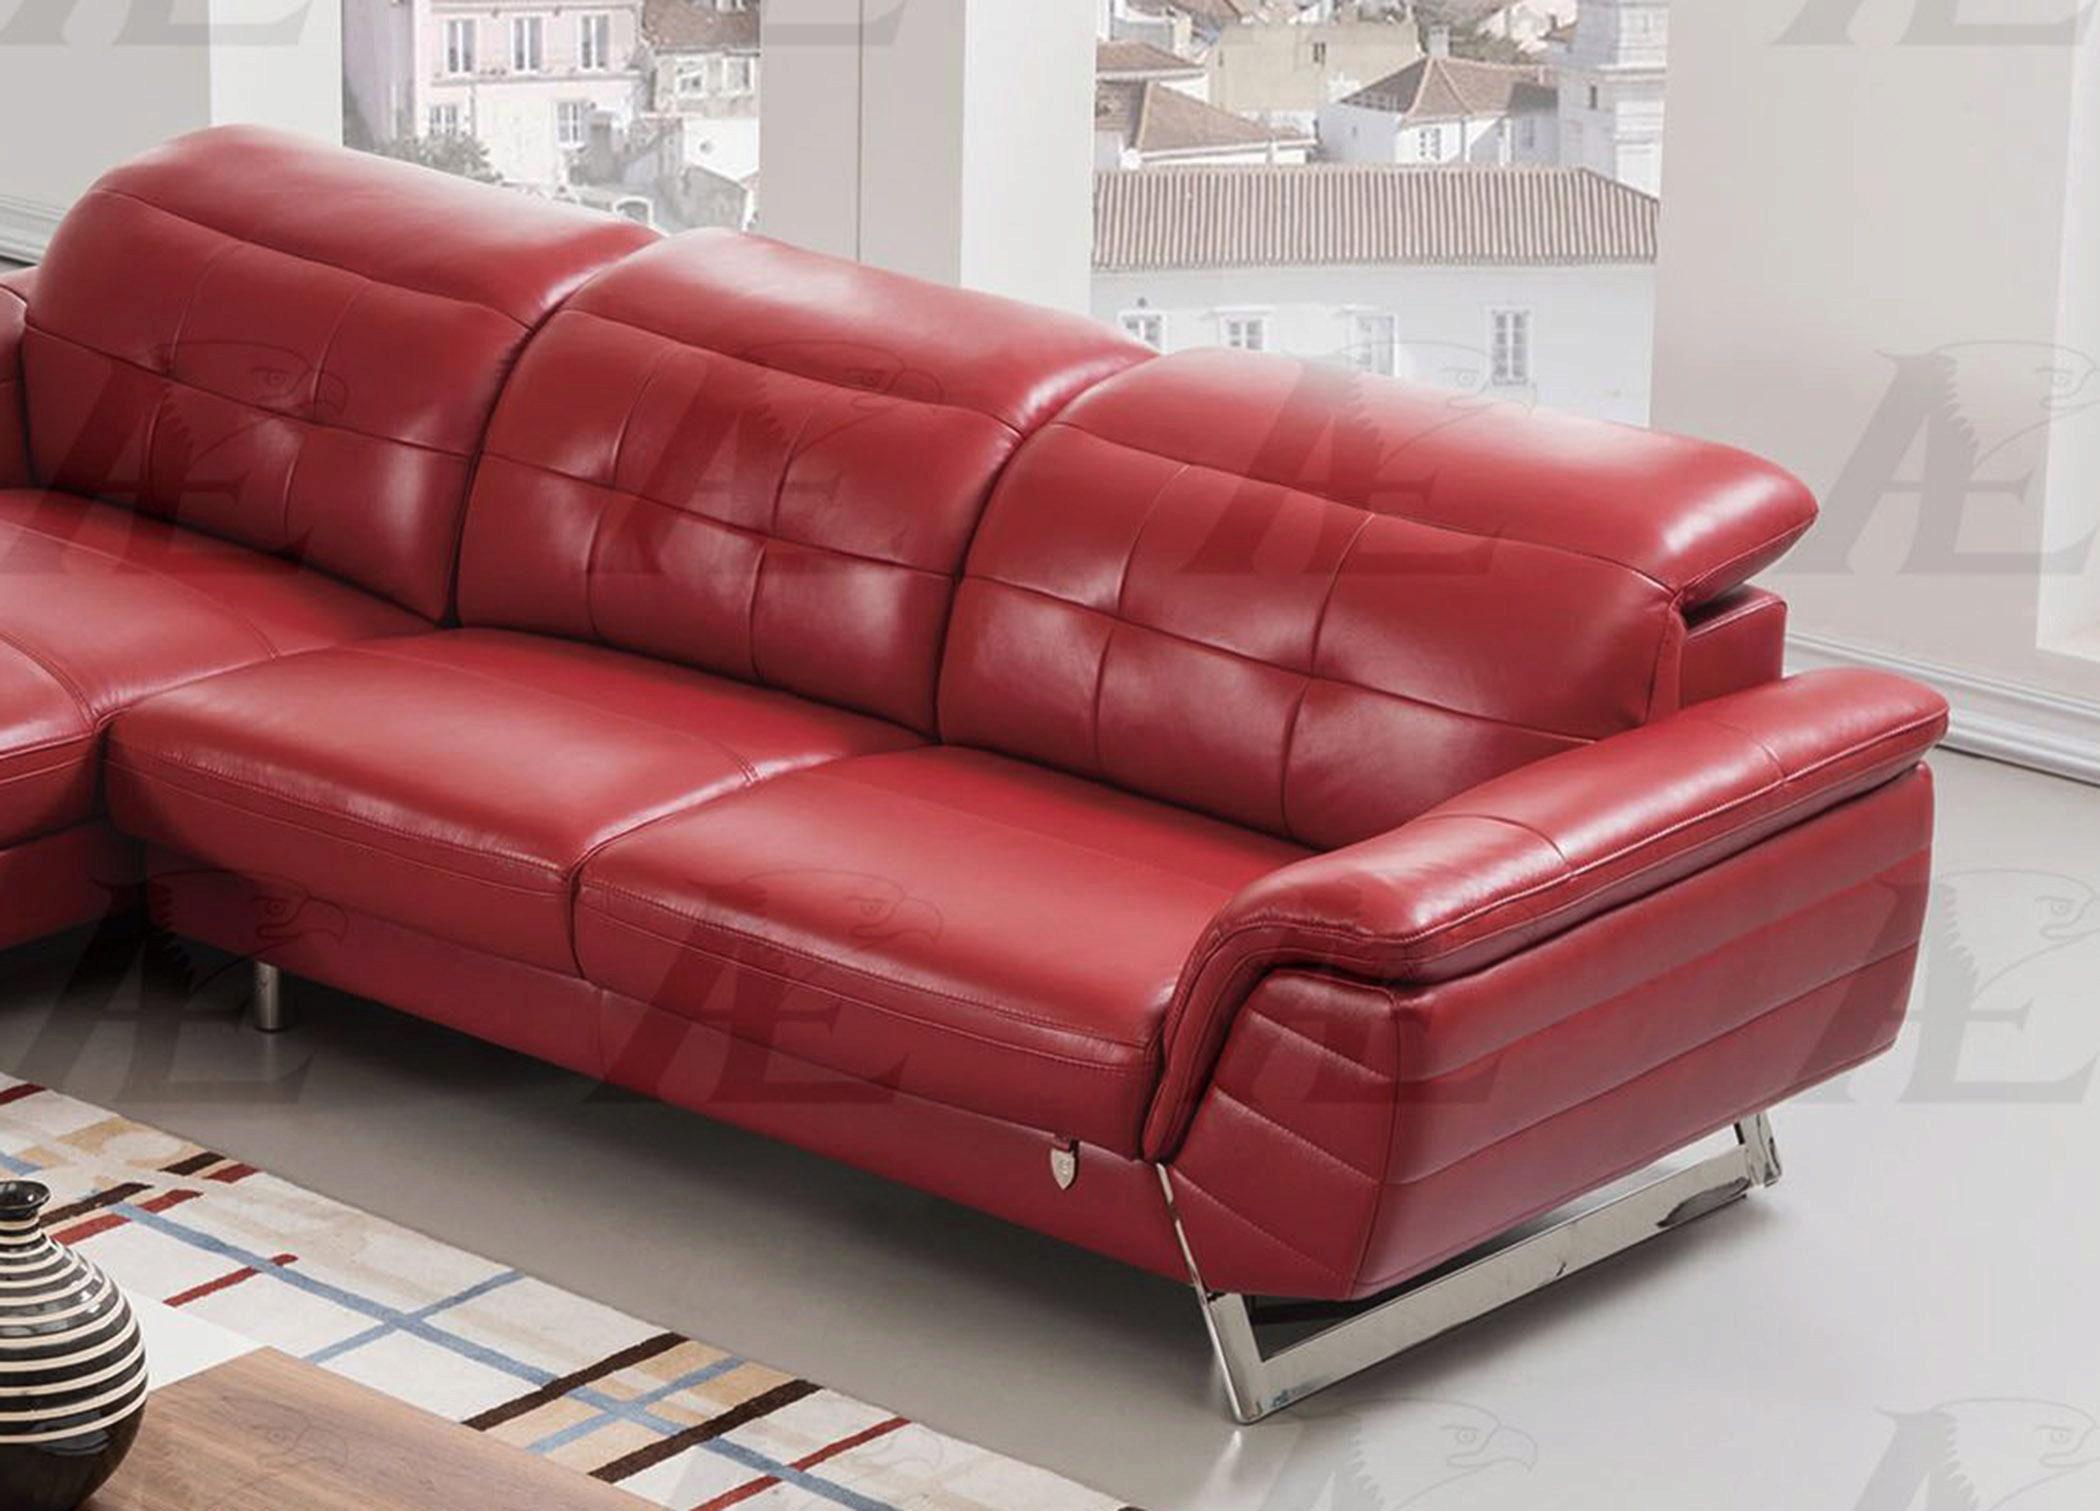 sectional sofa chaise lhc italian leather 2pcs american eagle ek l085 red